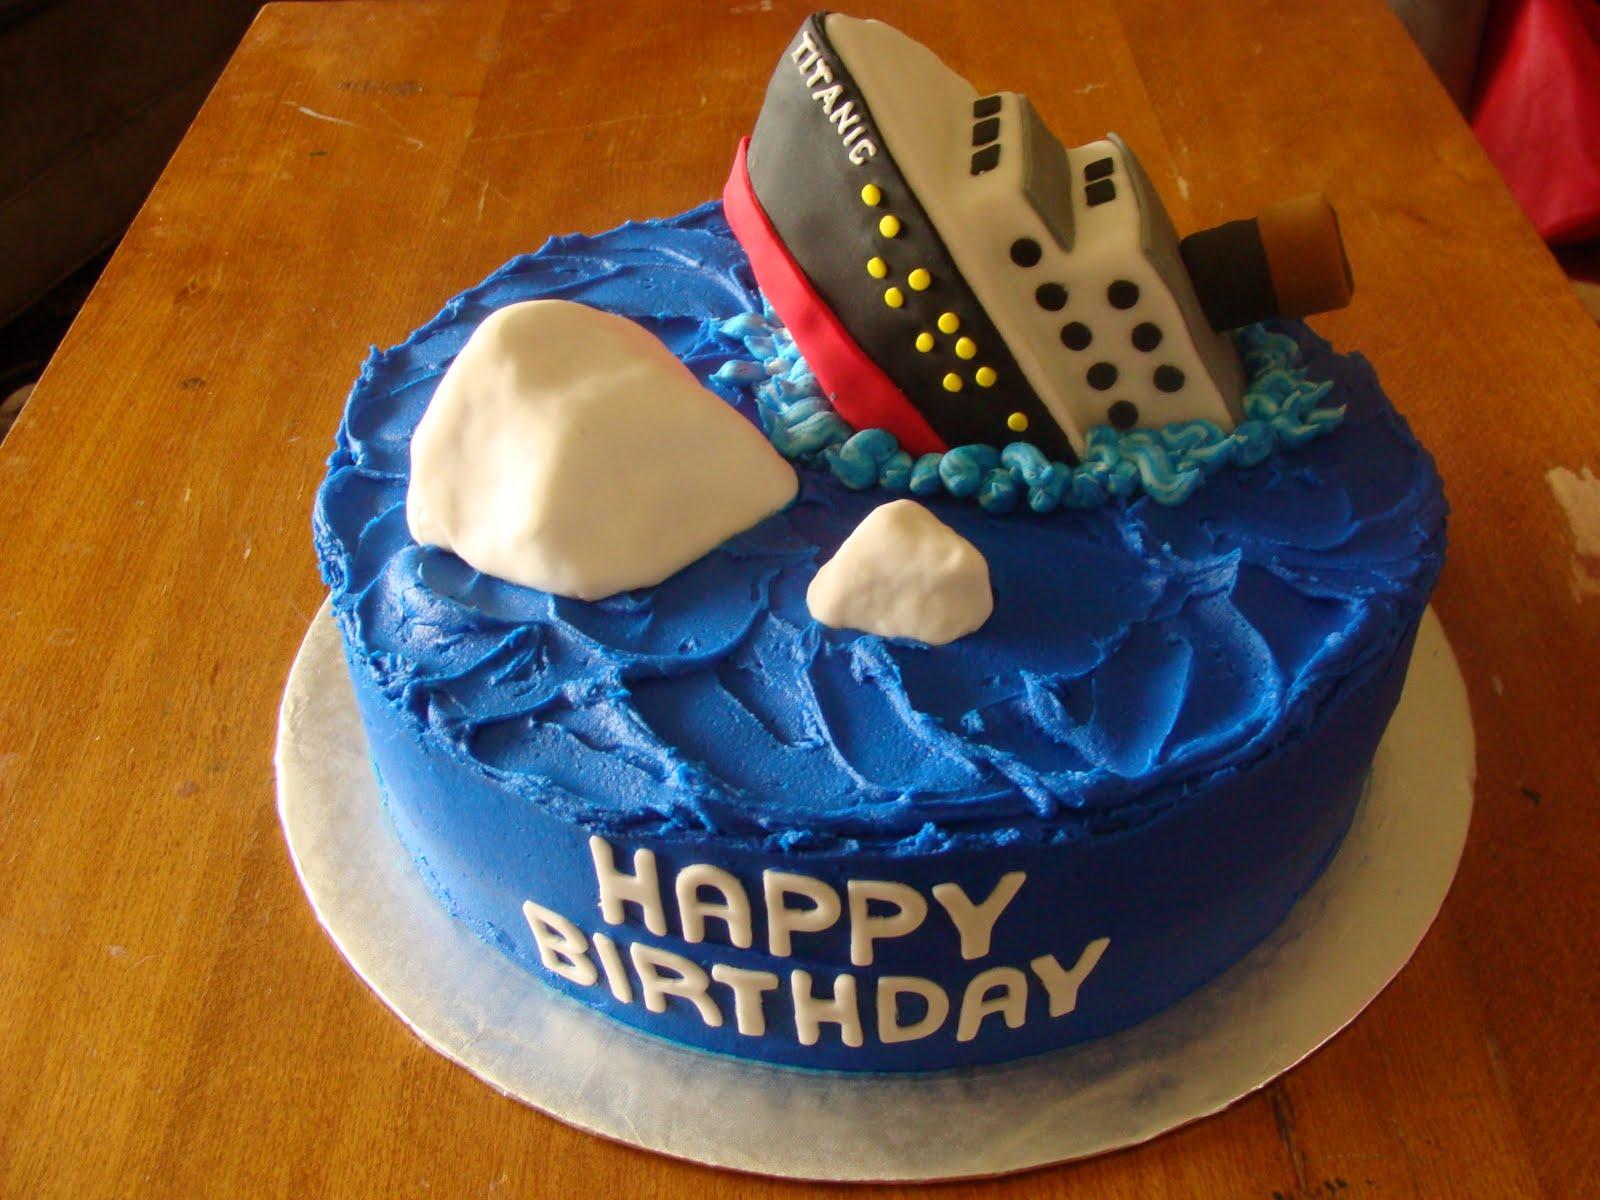 Sweet treats by bonnie titanic cake titanic cake publicscrutiny Gallery